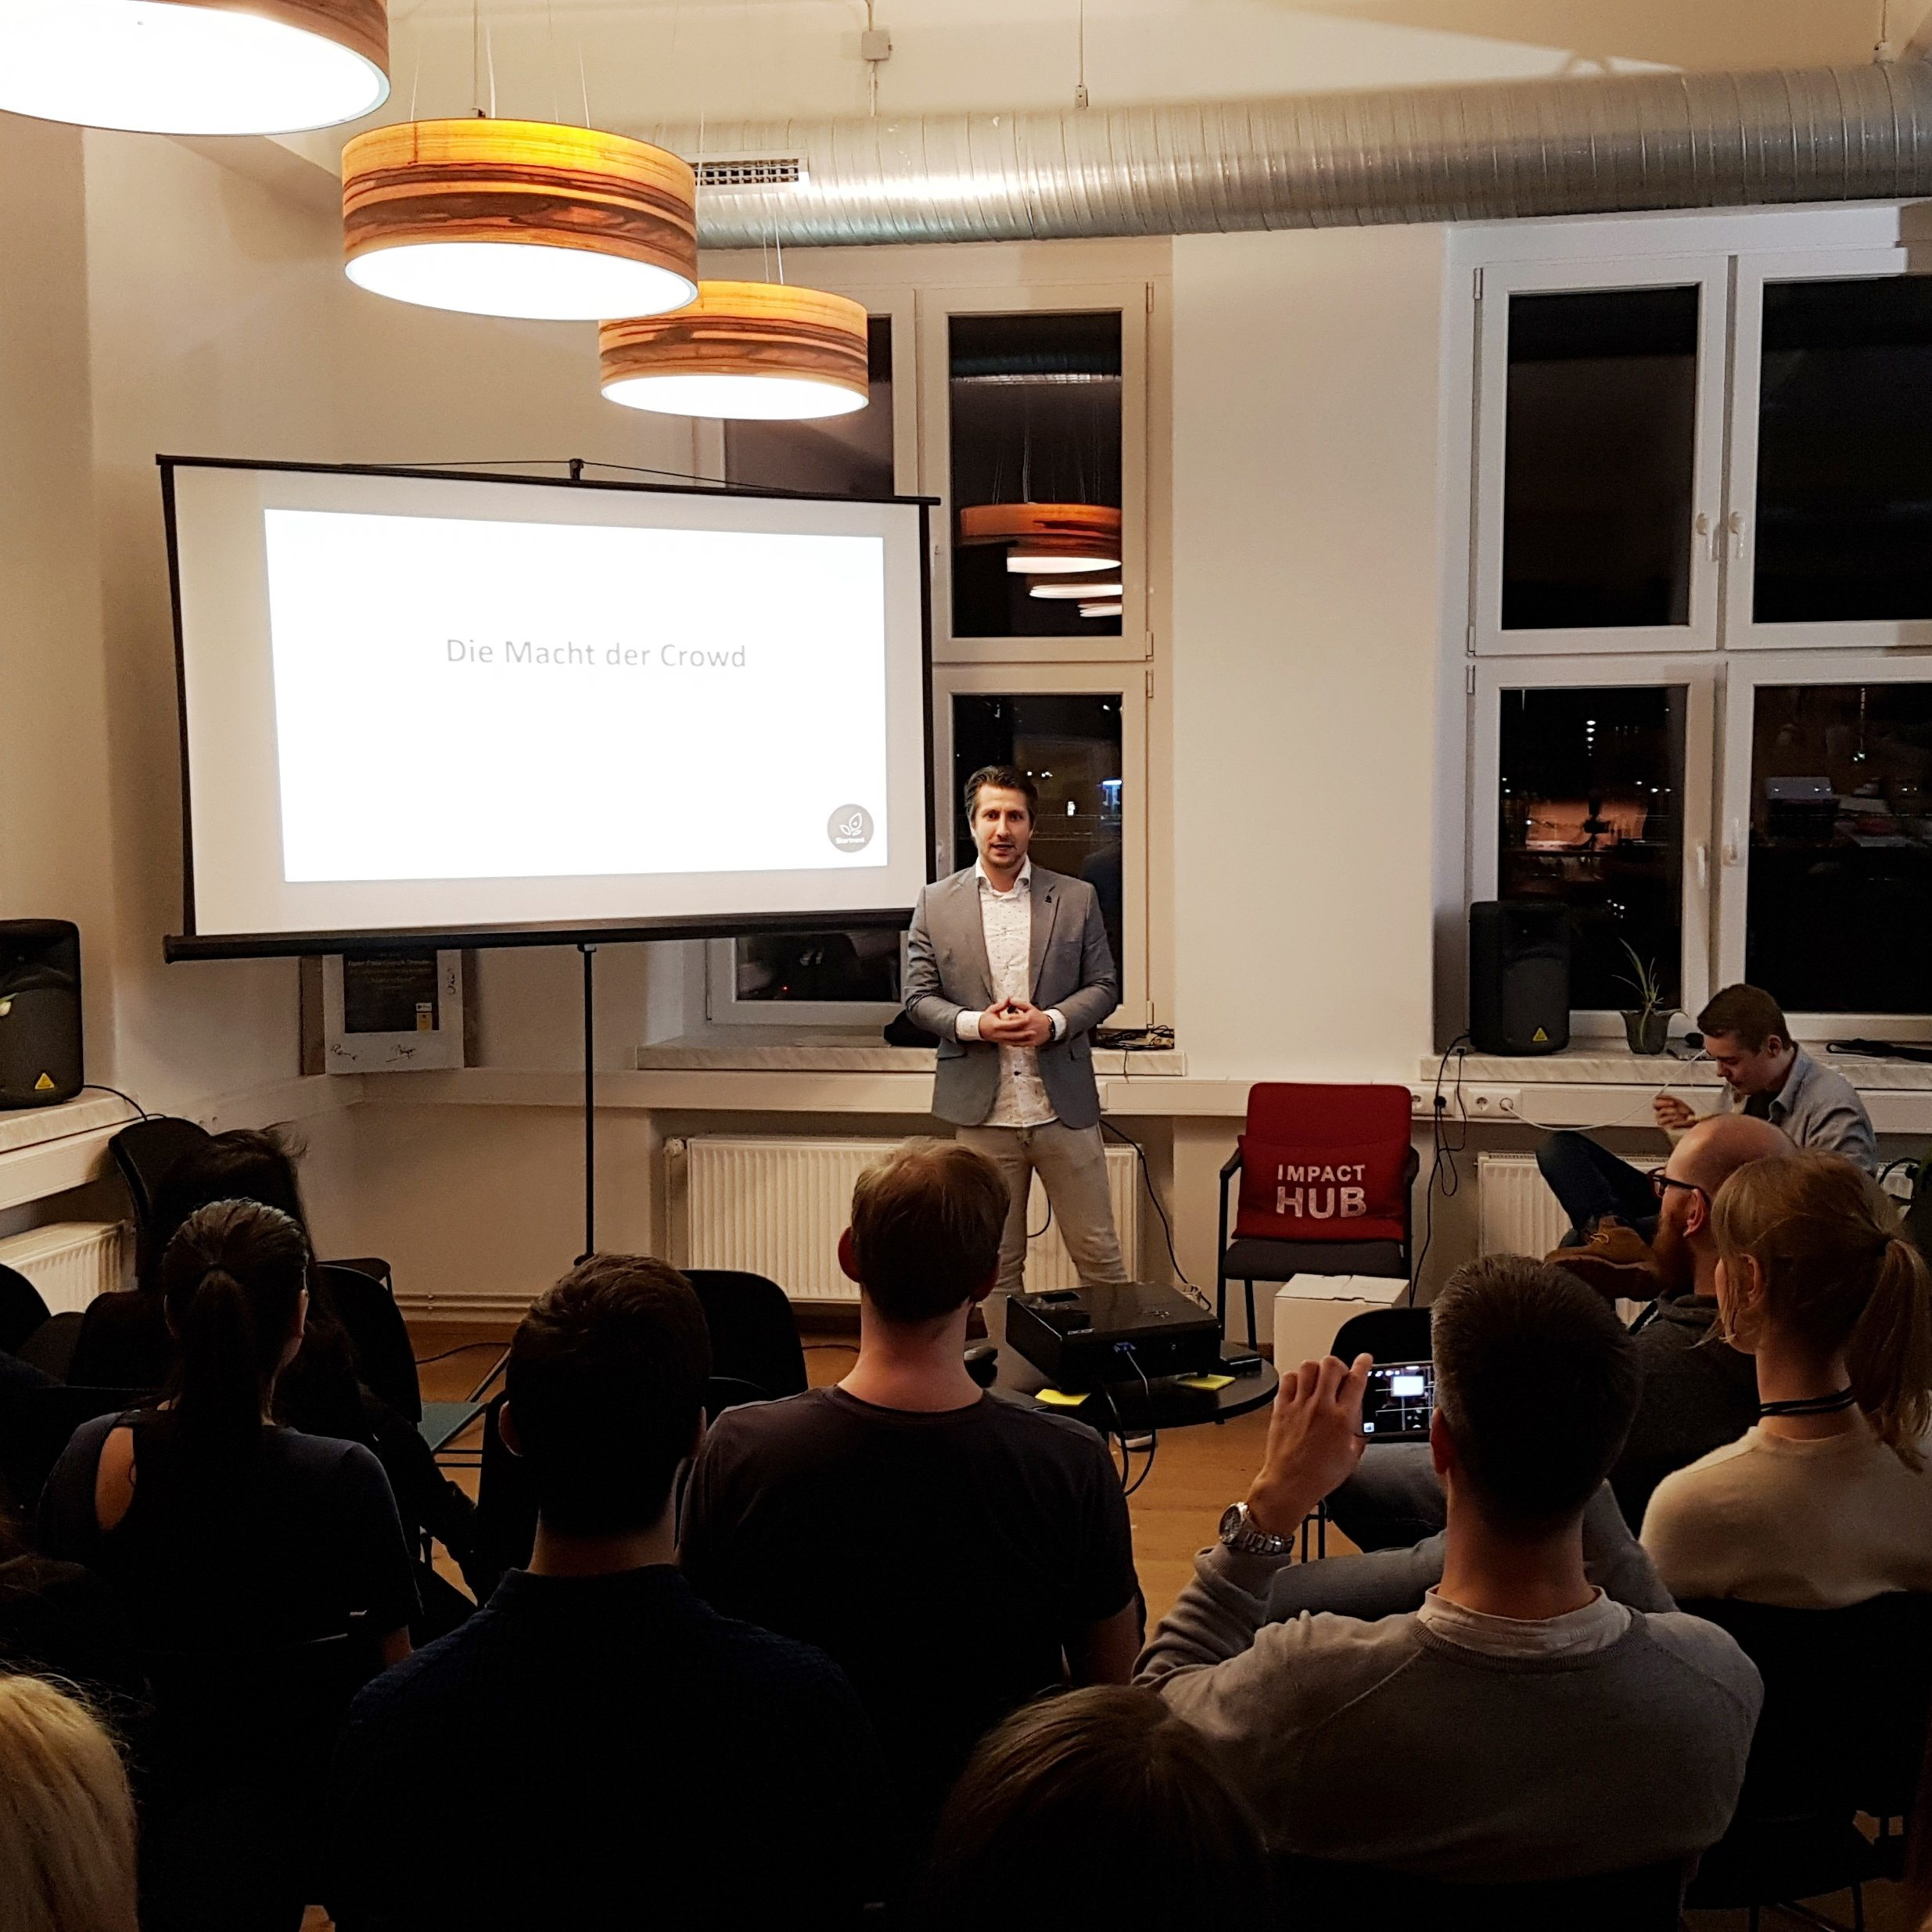 Global-Service-Jam-2018 - Lars Räbiger von neorot